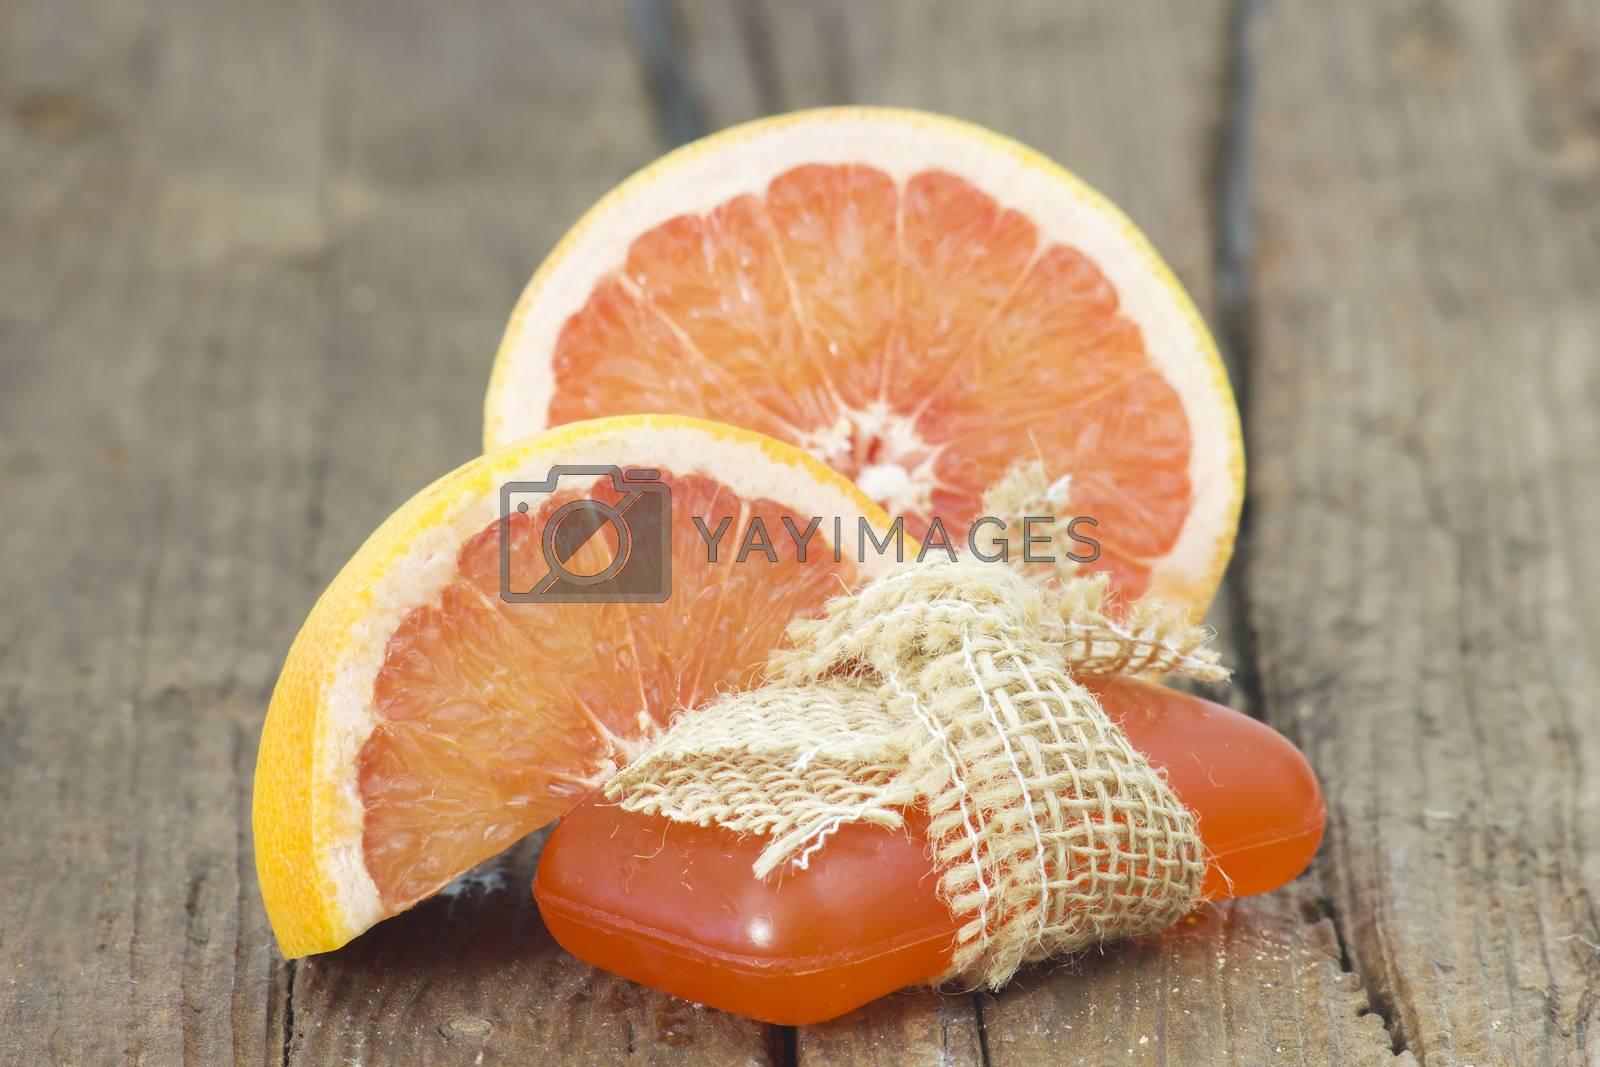 bar of glycerine soap and grapefruit